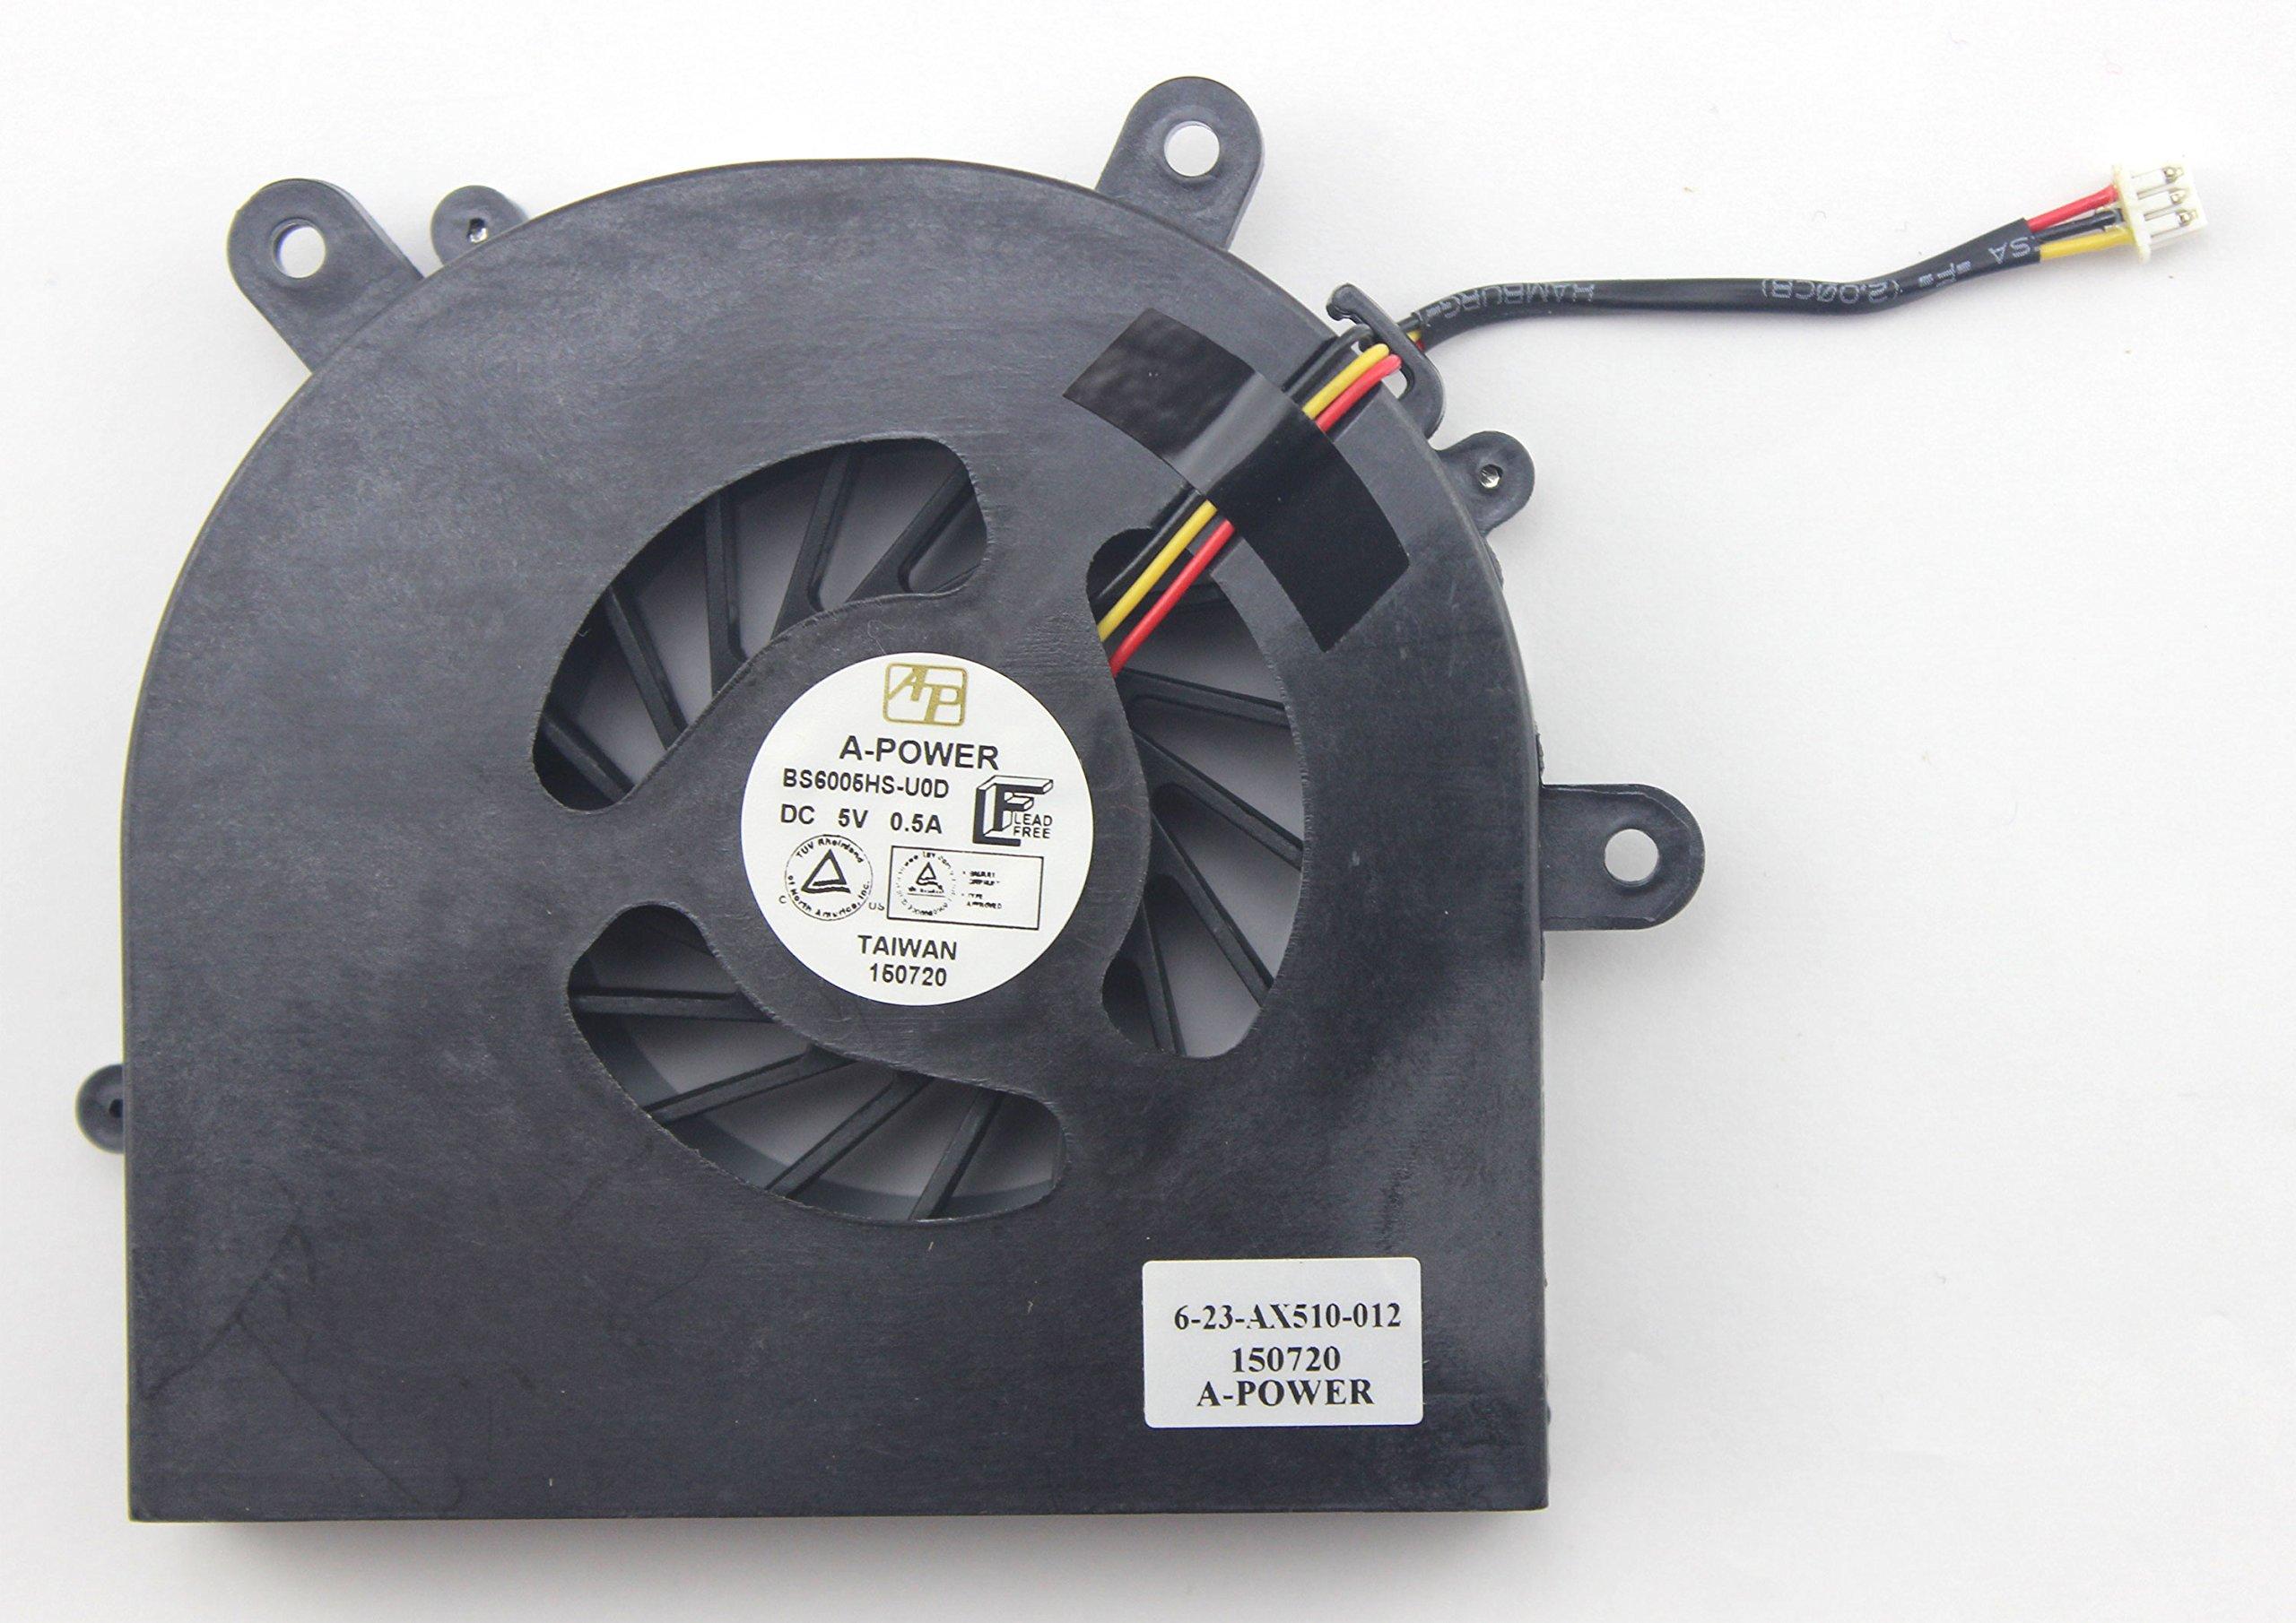 CHNASAWE Laptop CPU Fan for Clevo P150EM P150HM P150SM P150SM-A P151EM1 P151HM P151HM1 P151SM P151SM-A